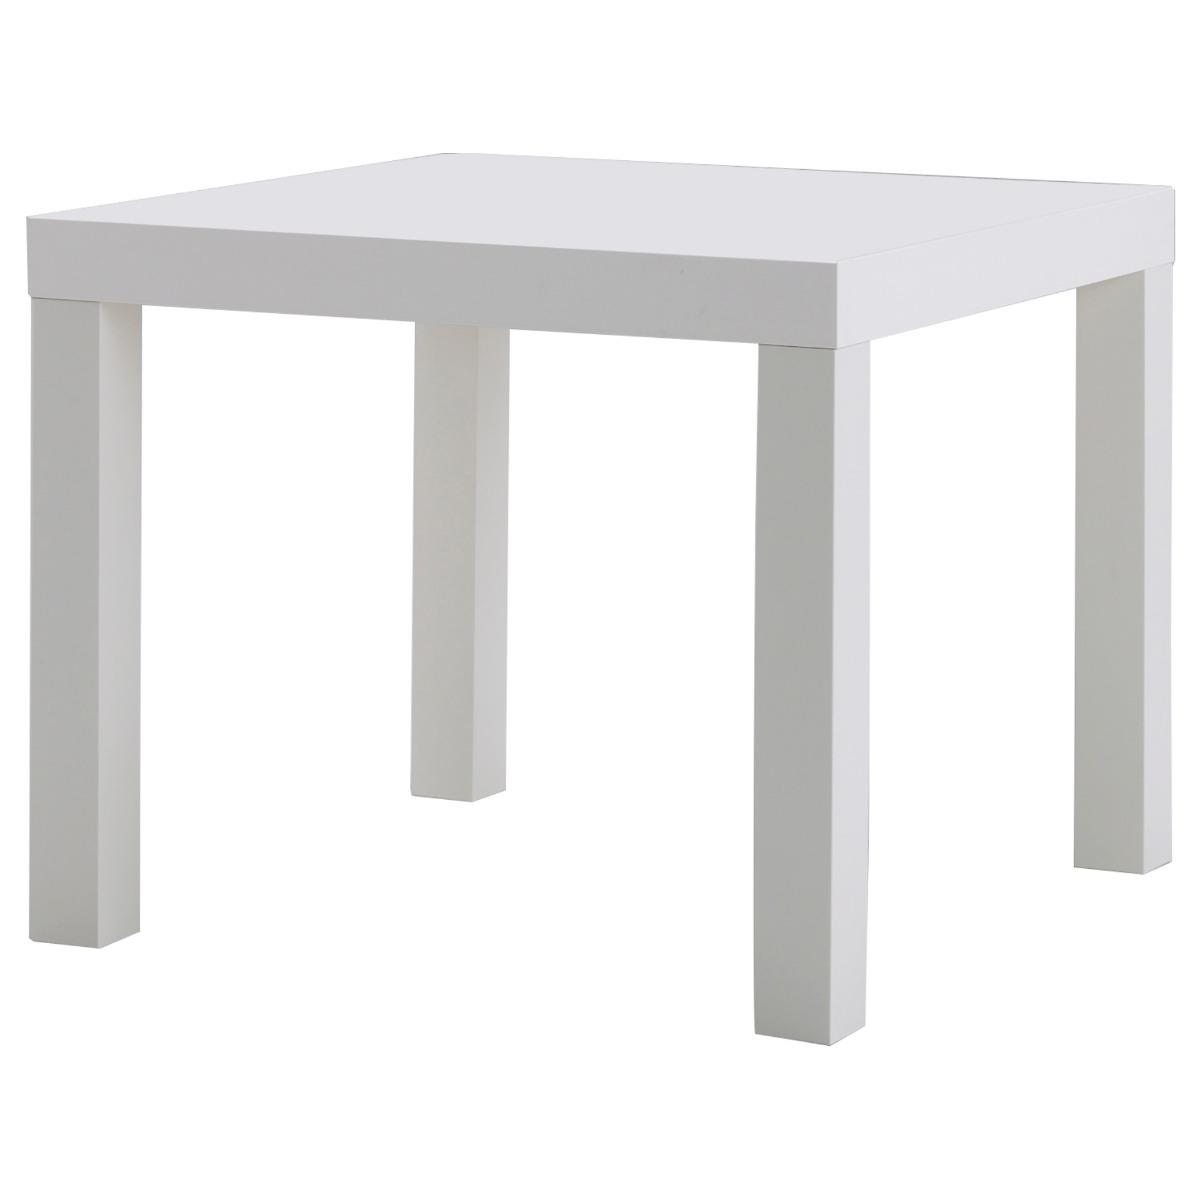 Ikea lack mesa auxiliar blanca en mercado libre for Mesa auxiliar plegable ikea